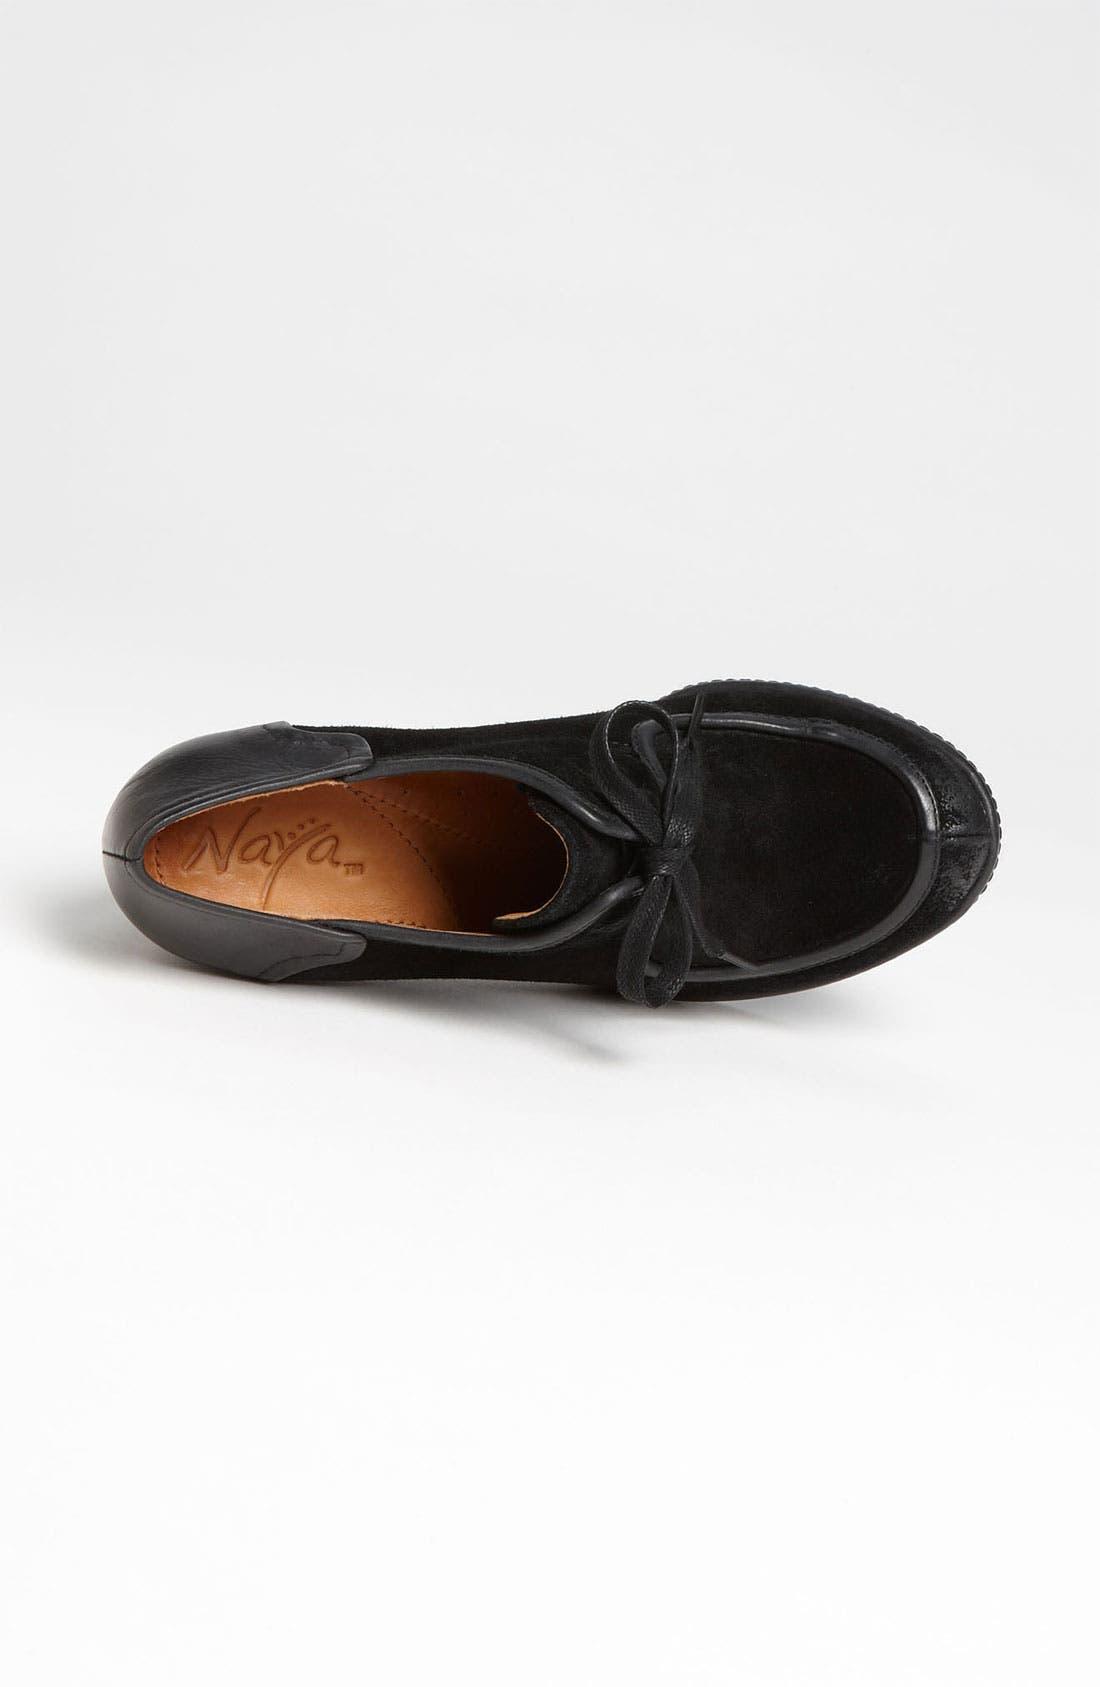 Alternate Image 3  - Naya 'Mindy' Boot